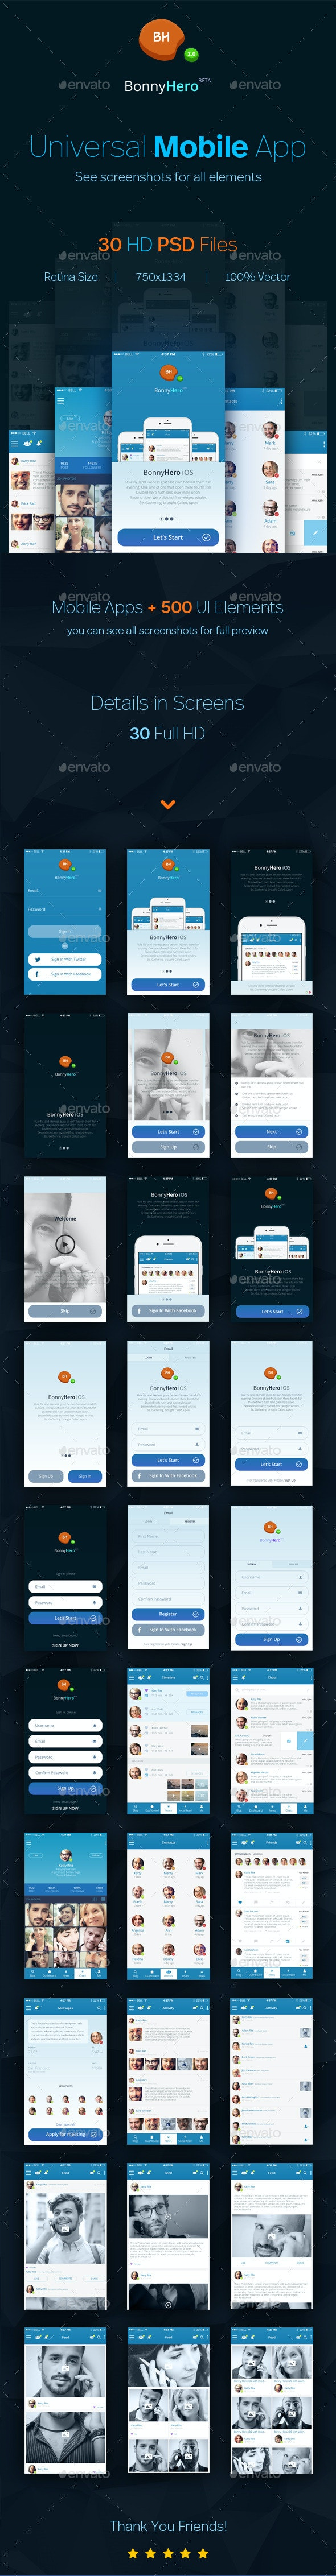 Bonny Hero App | Phone | Mobile UI ver. 2.0 - User Interfaces Web Elements